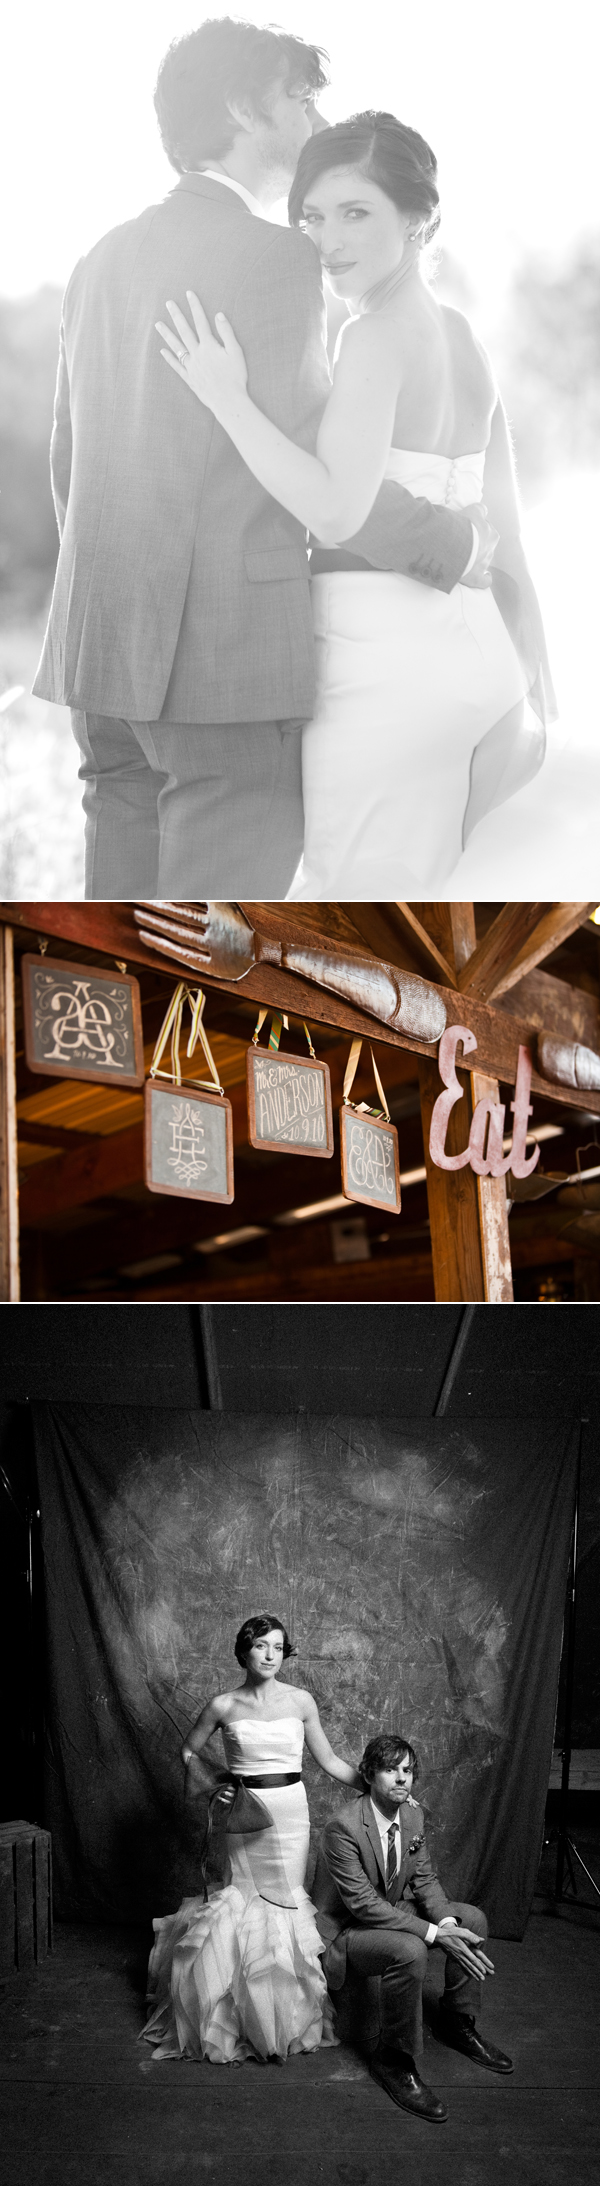 Parkeretc_weddinganniversary_2.jpg